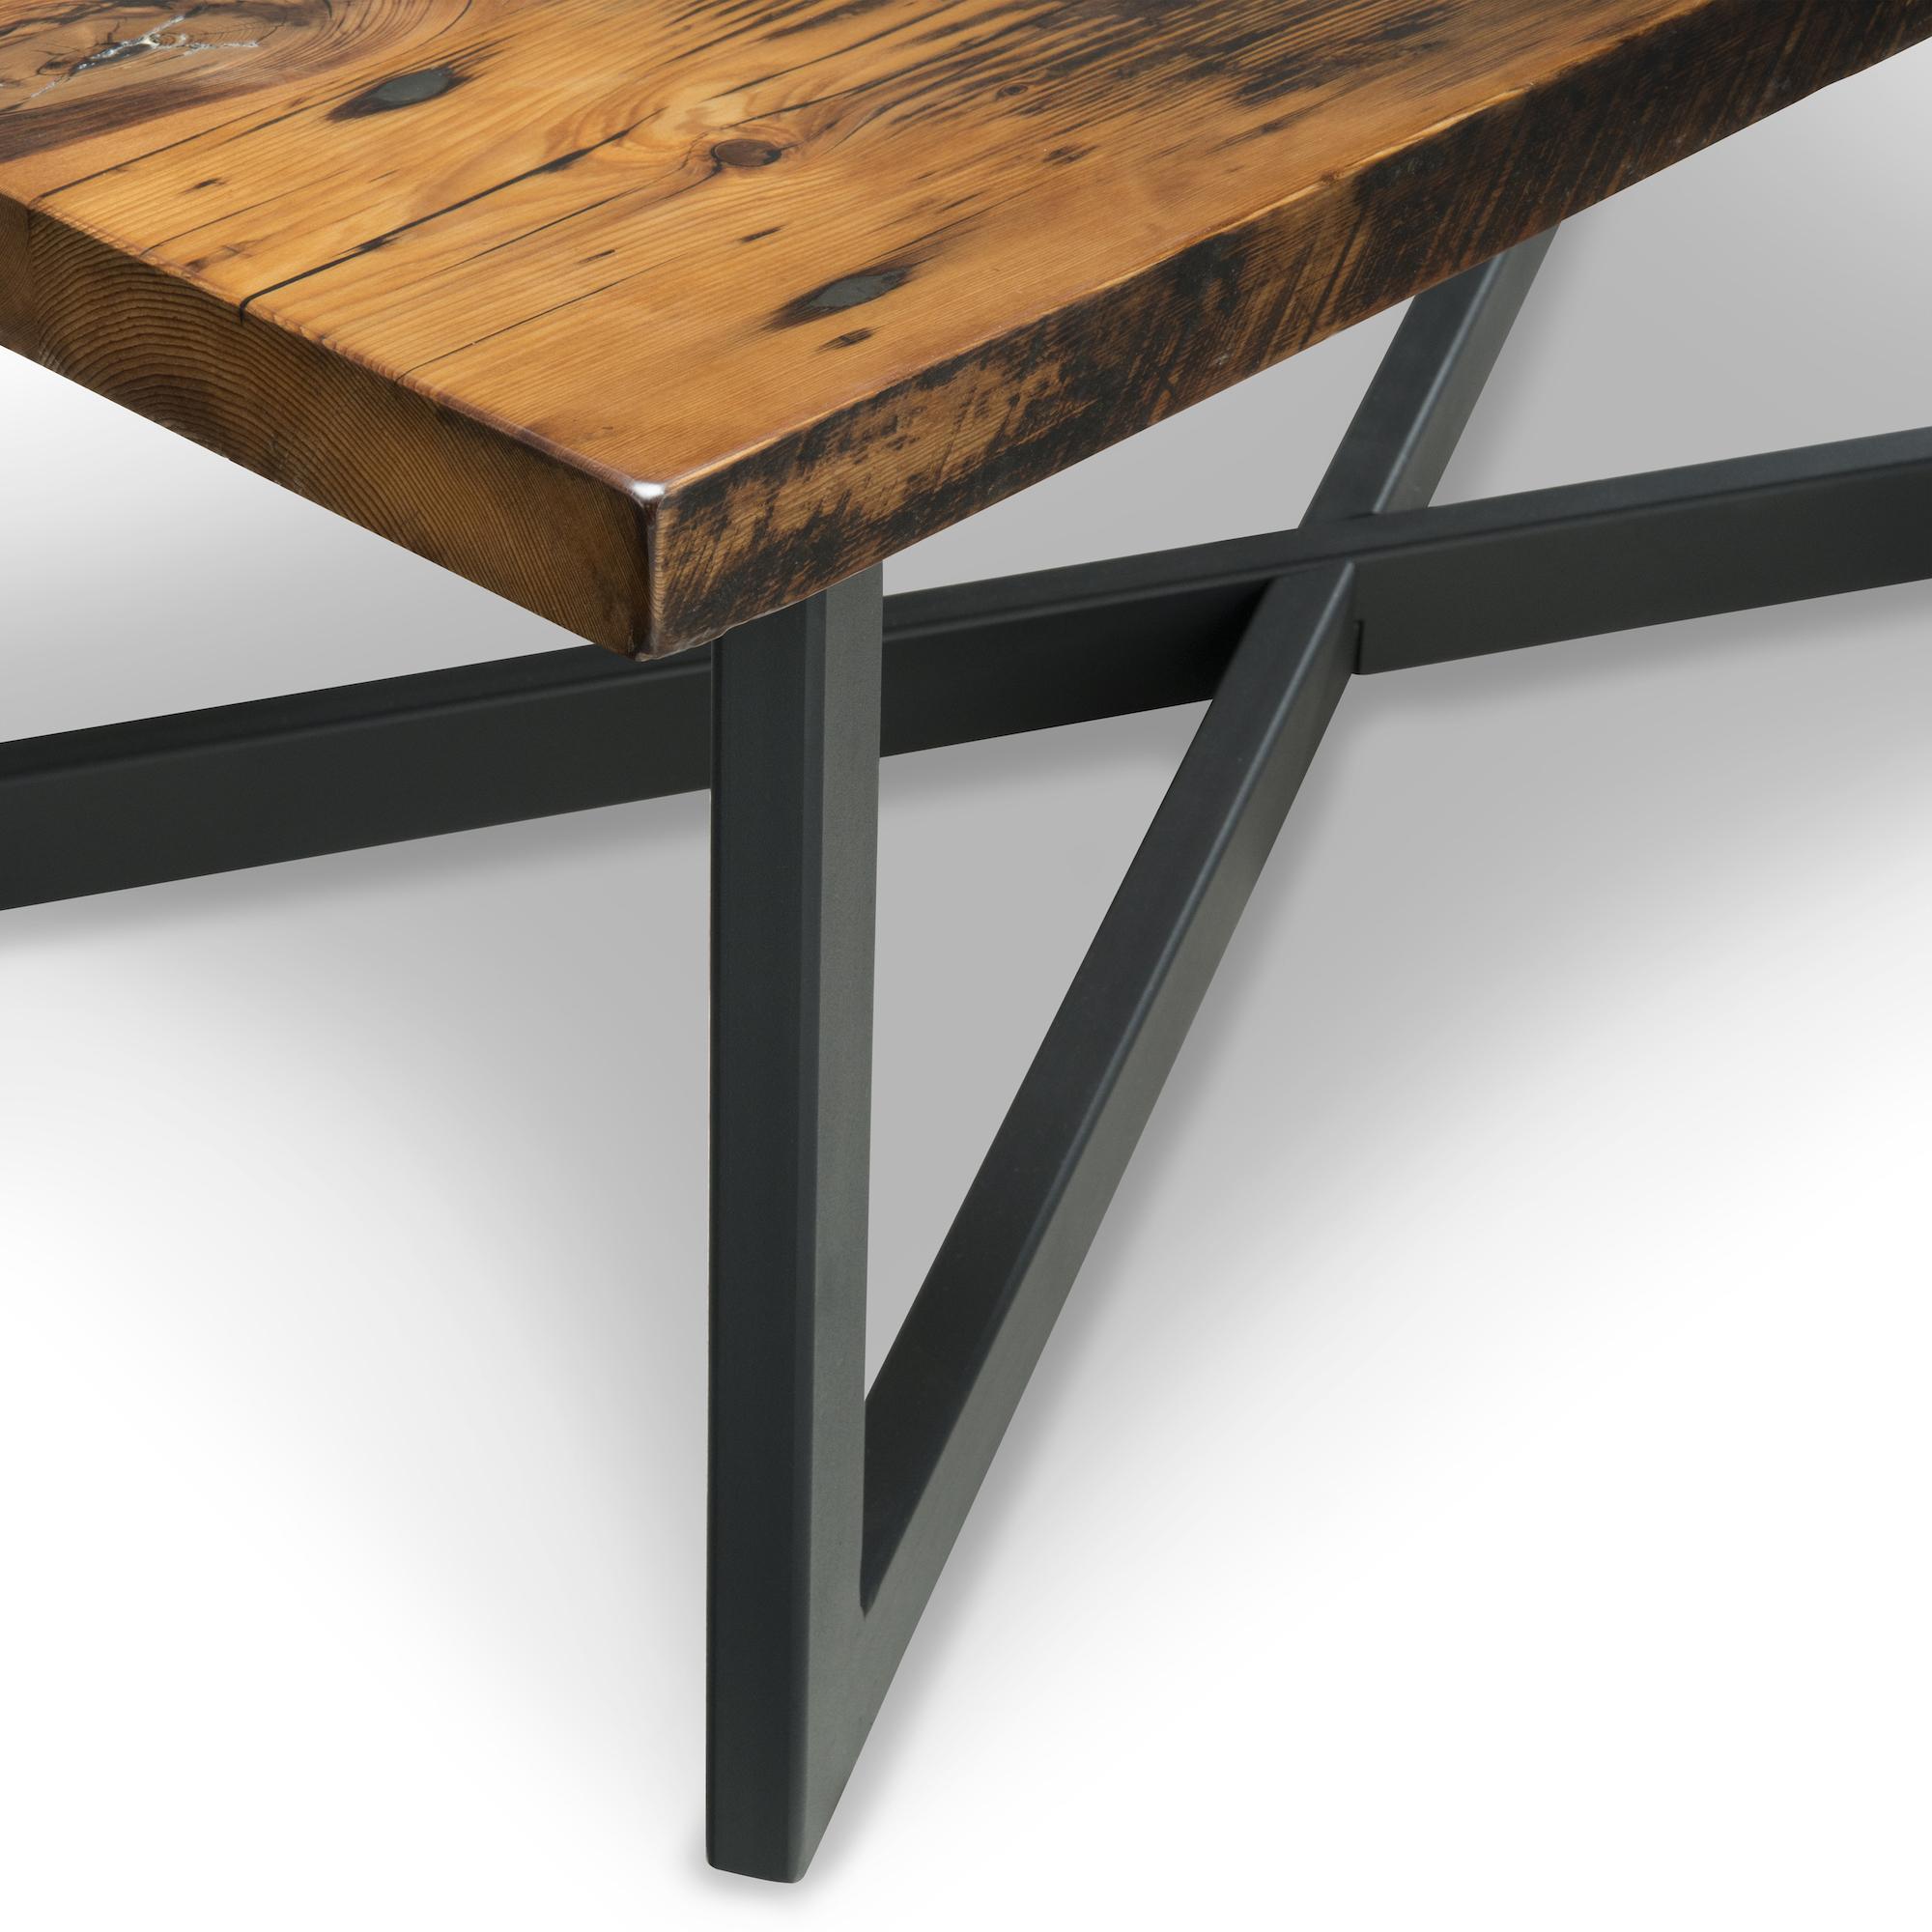 Portland_Coffee_Table_Detail-1-1.jpg